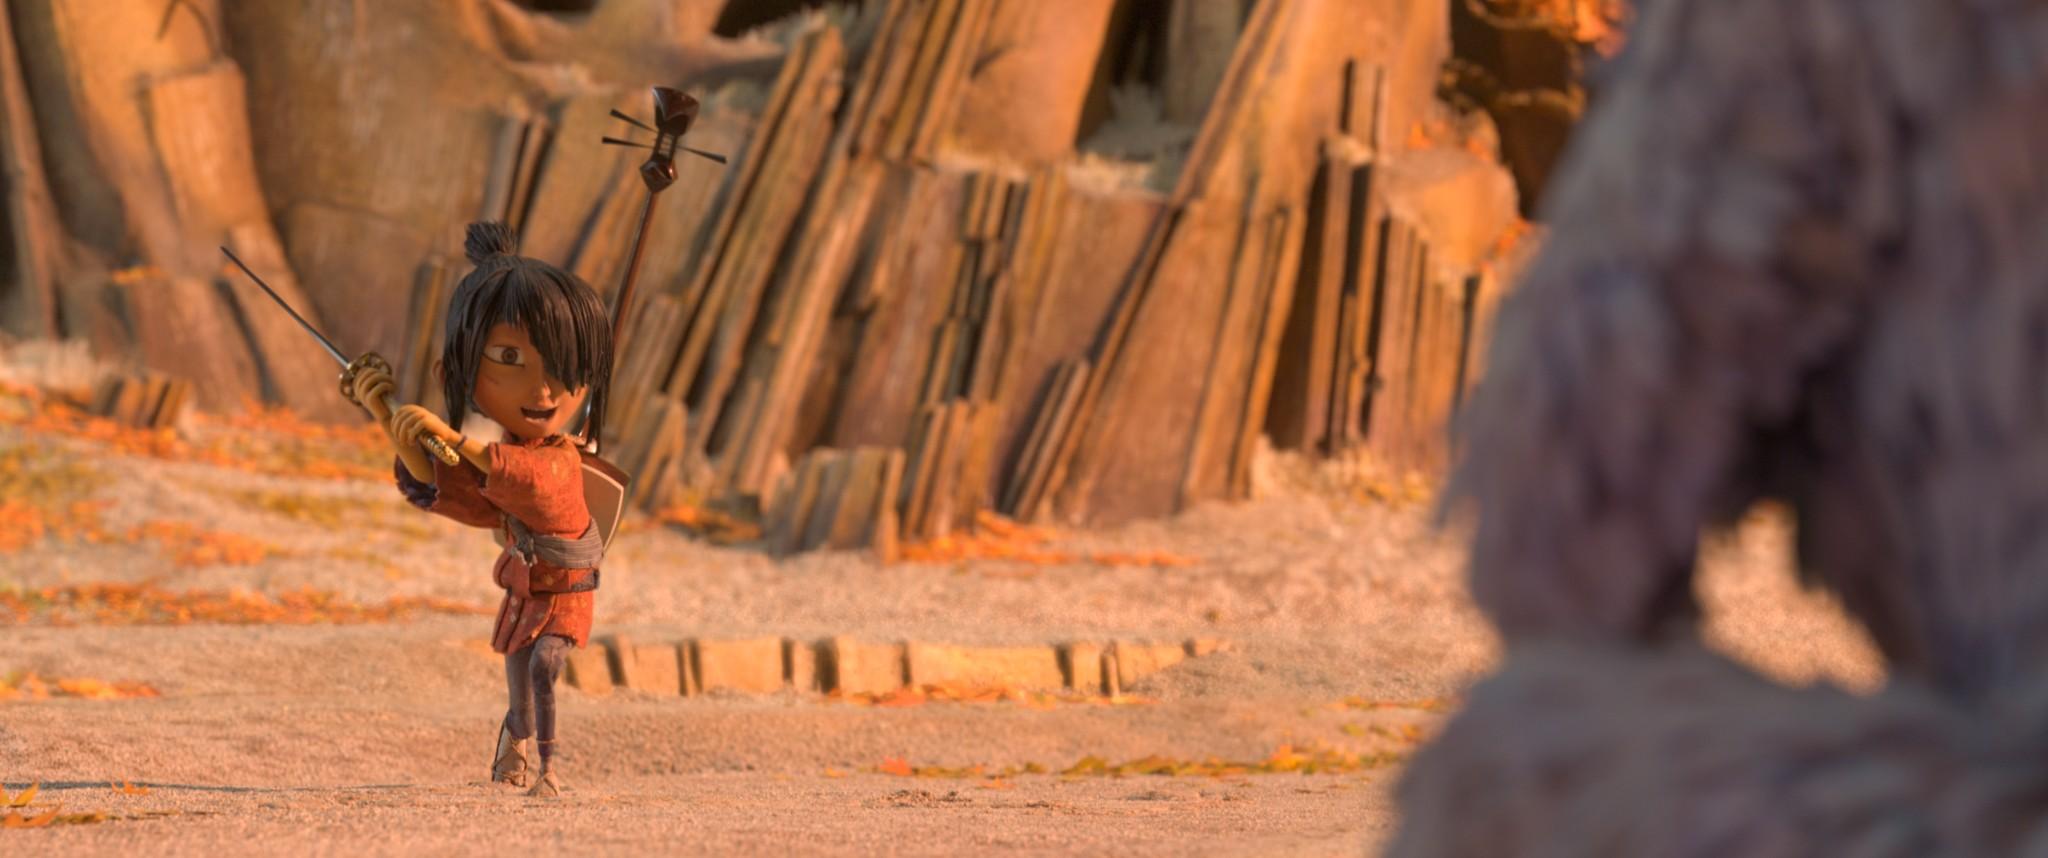 кадры из фильма Кубо. Легенда о самурае